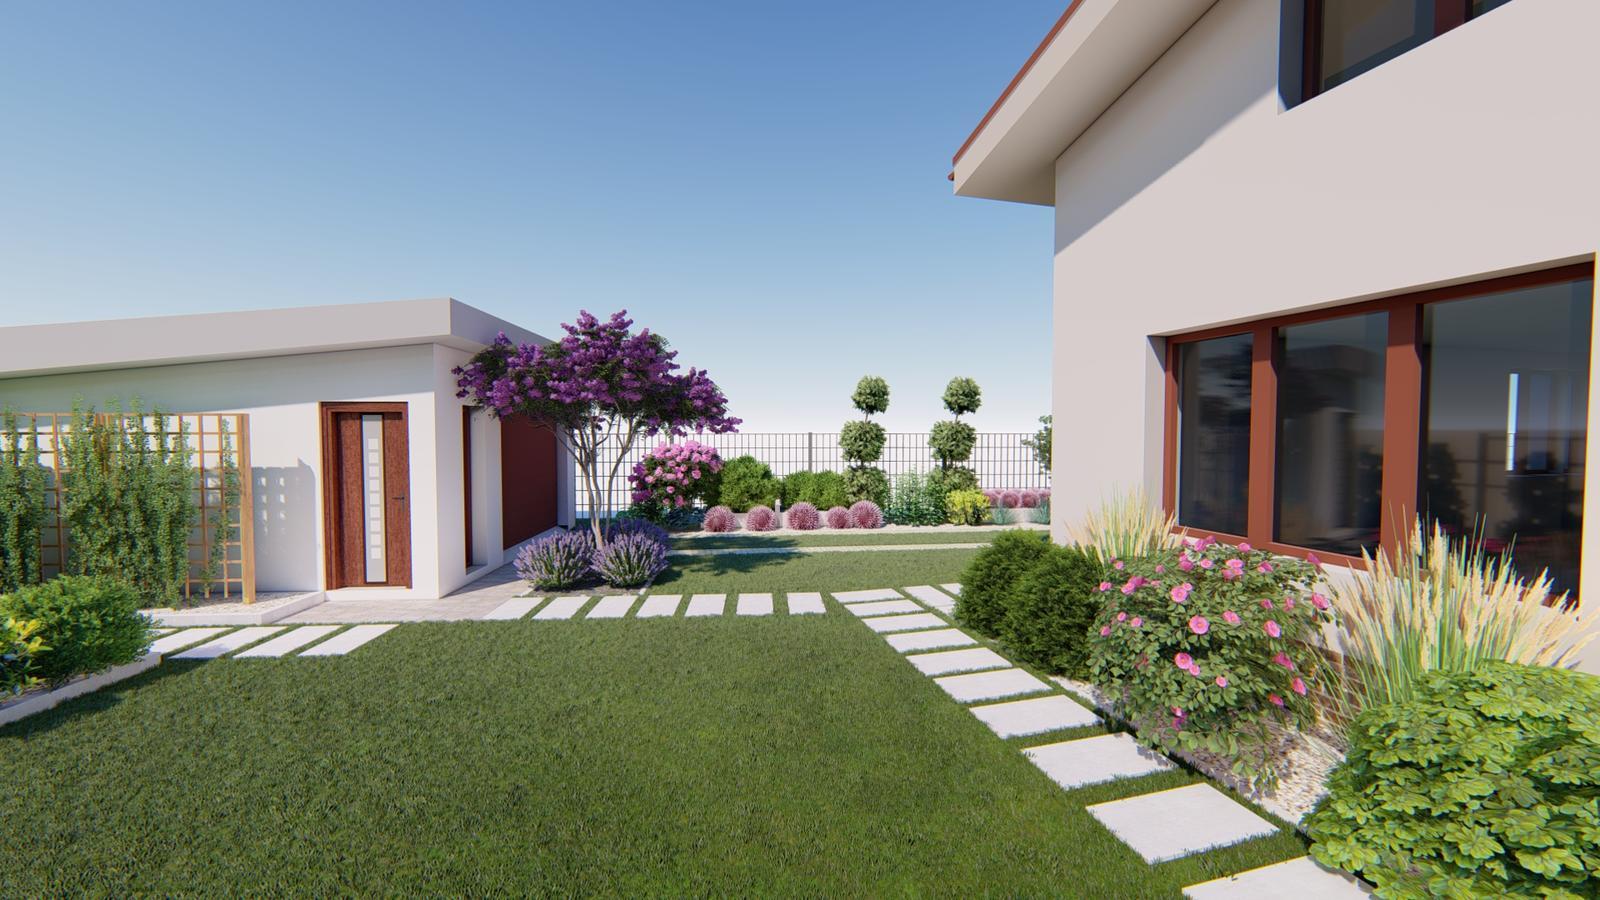 Návrh záhrady rodinného domu. - Obrázok č. 6